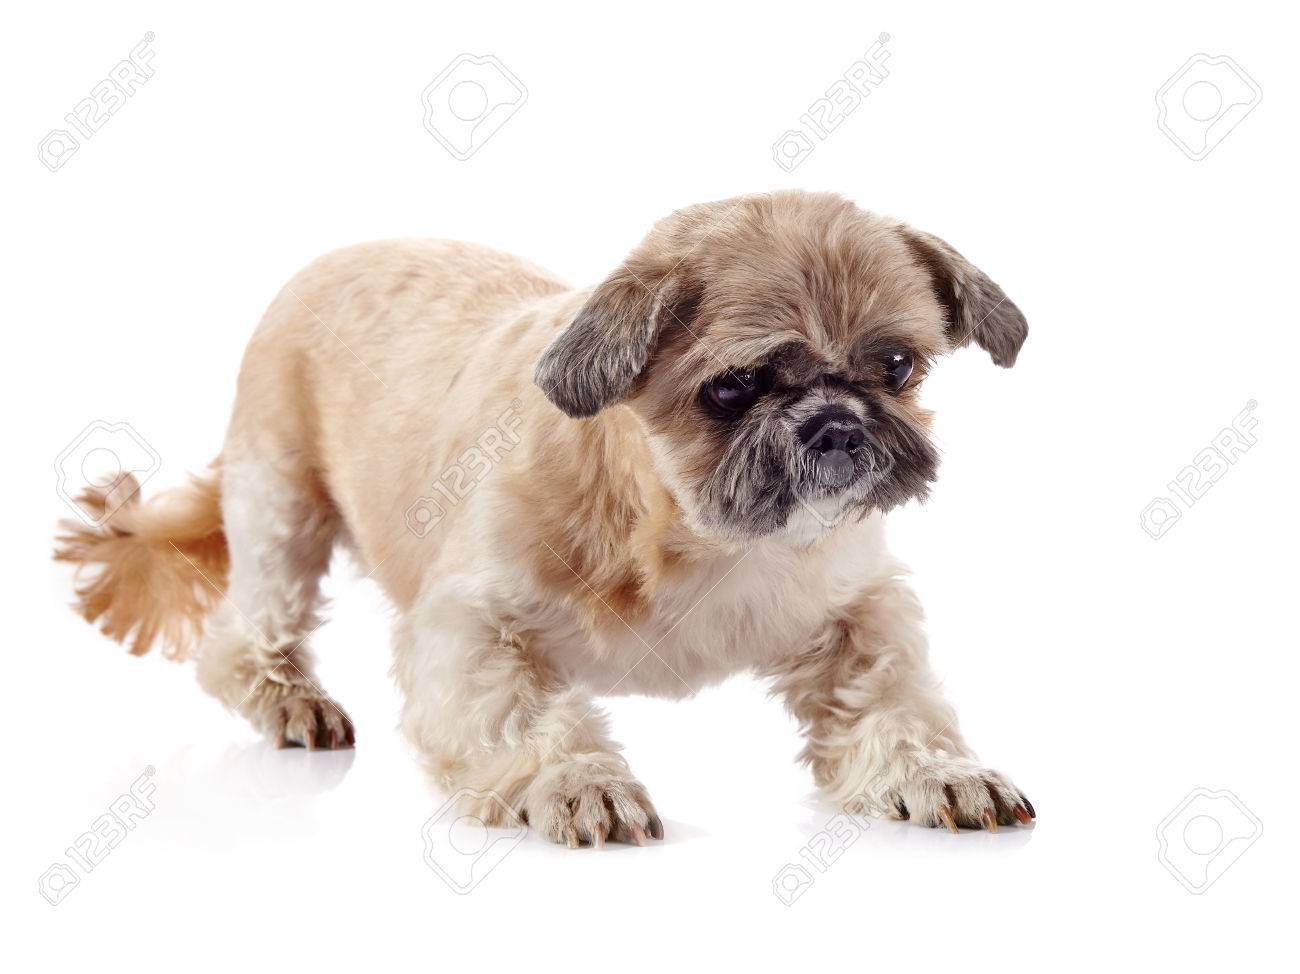 The Decorative Amusing Small Beige Doggie Of Breed Of A Shih Tzu